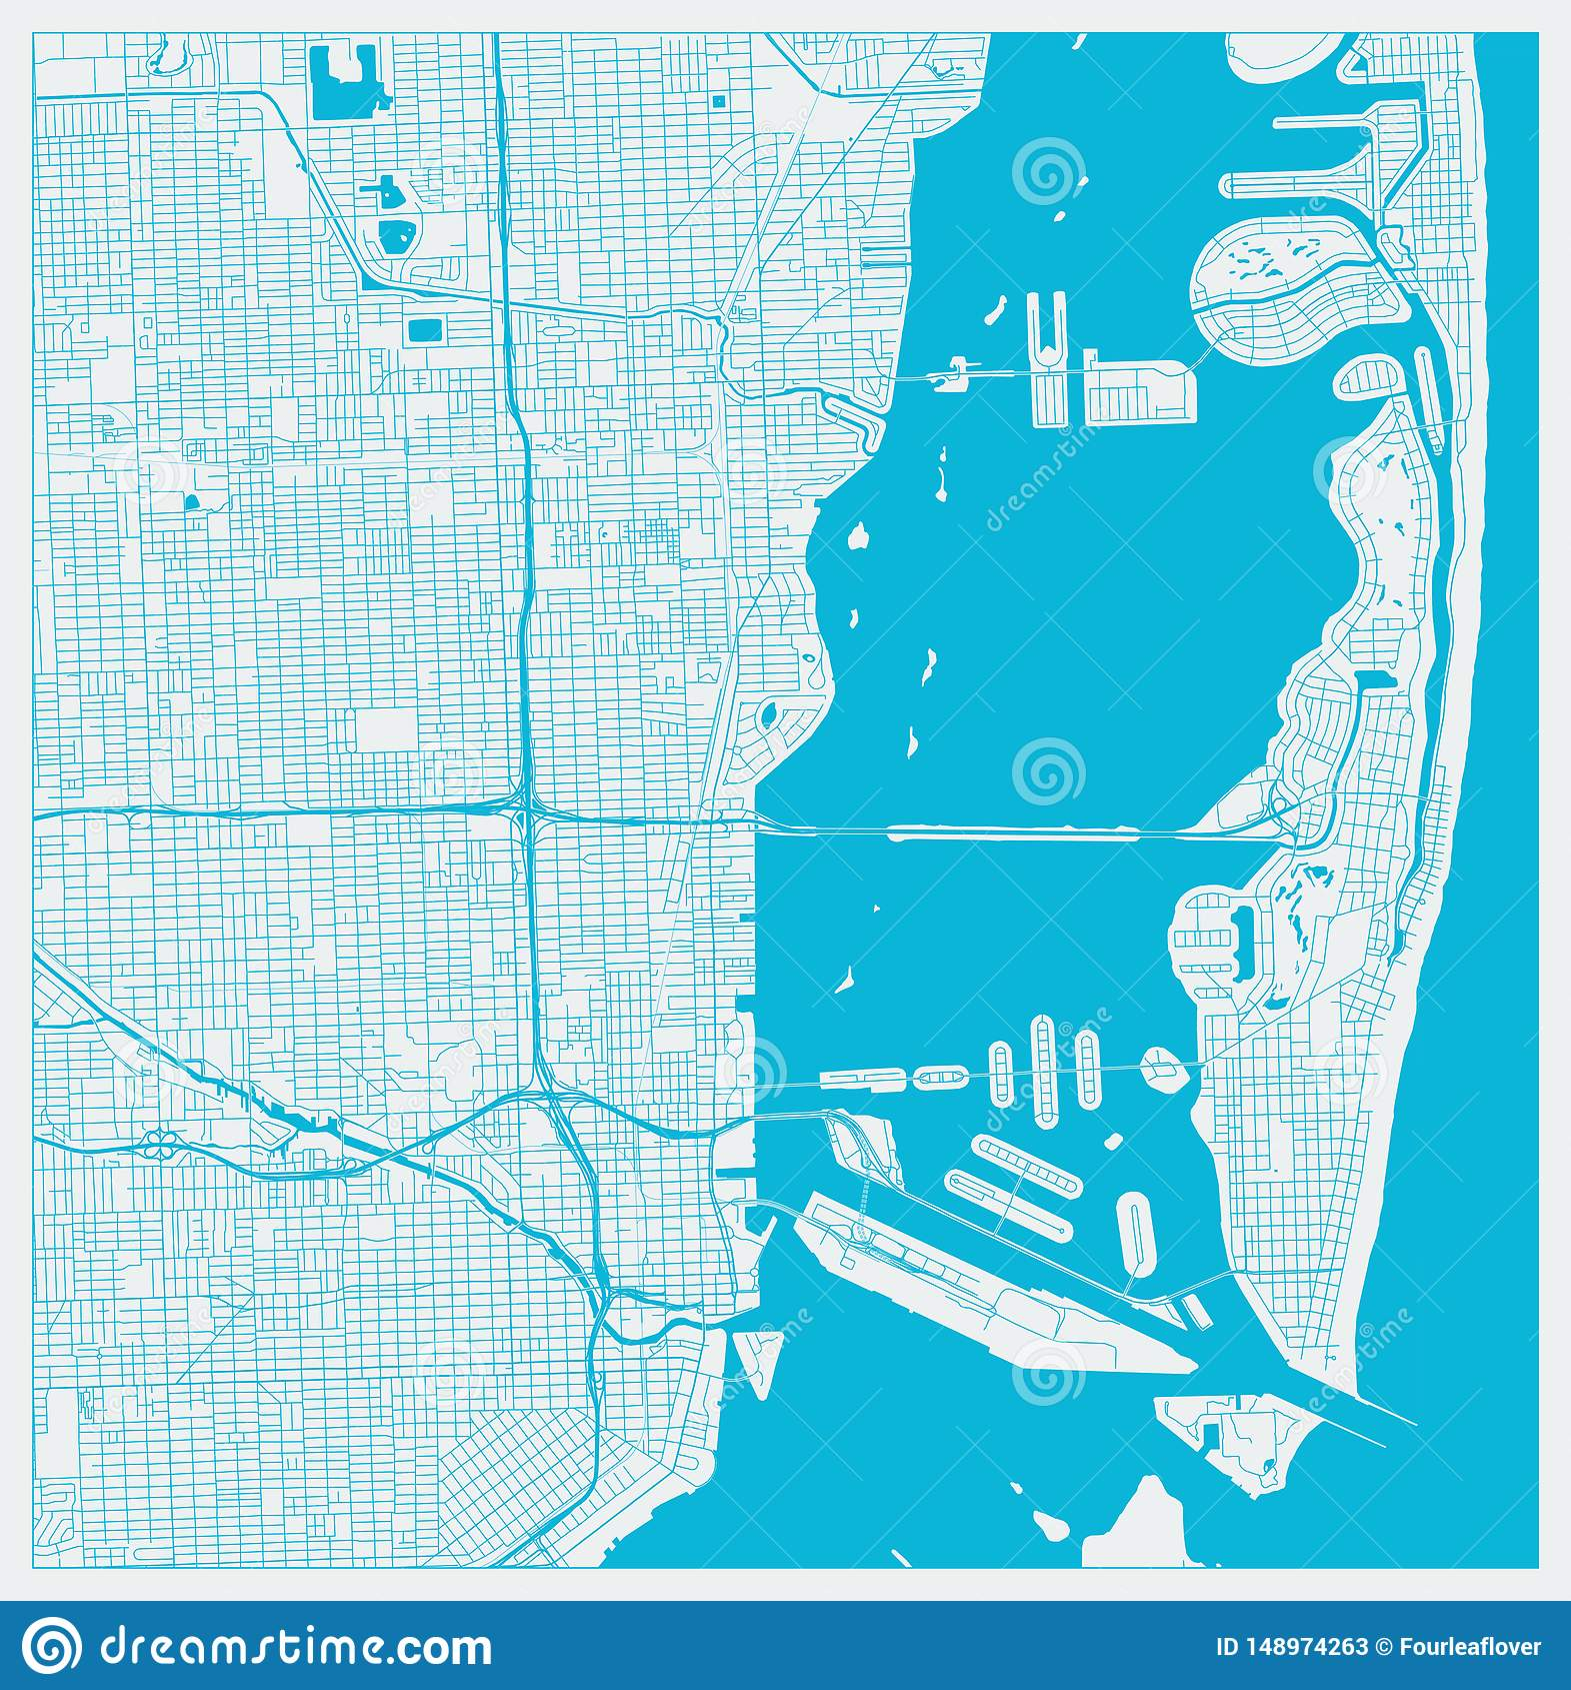 mapa de la ciudad de miami, la florida, los e.e.u.u. en